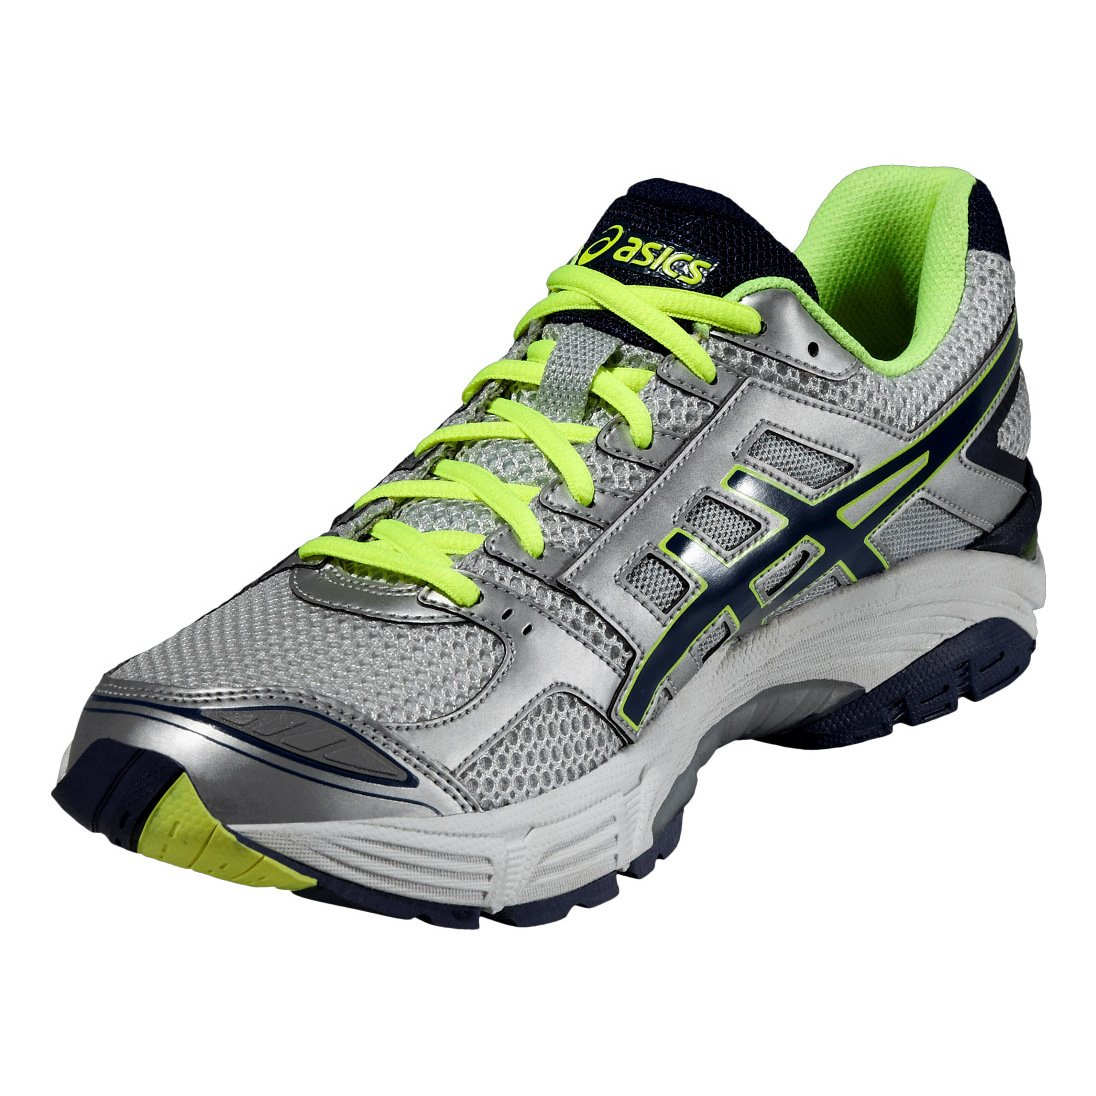 ASICS Gel Fortitude 6 Zapatillas de Running de Hombre t2